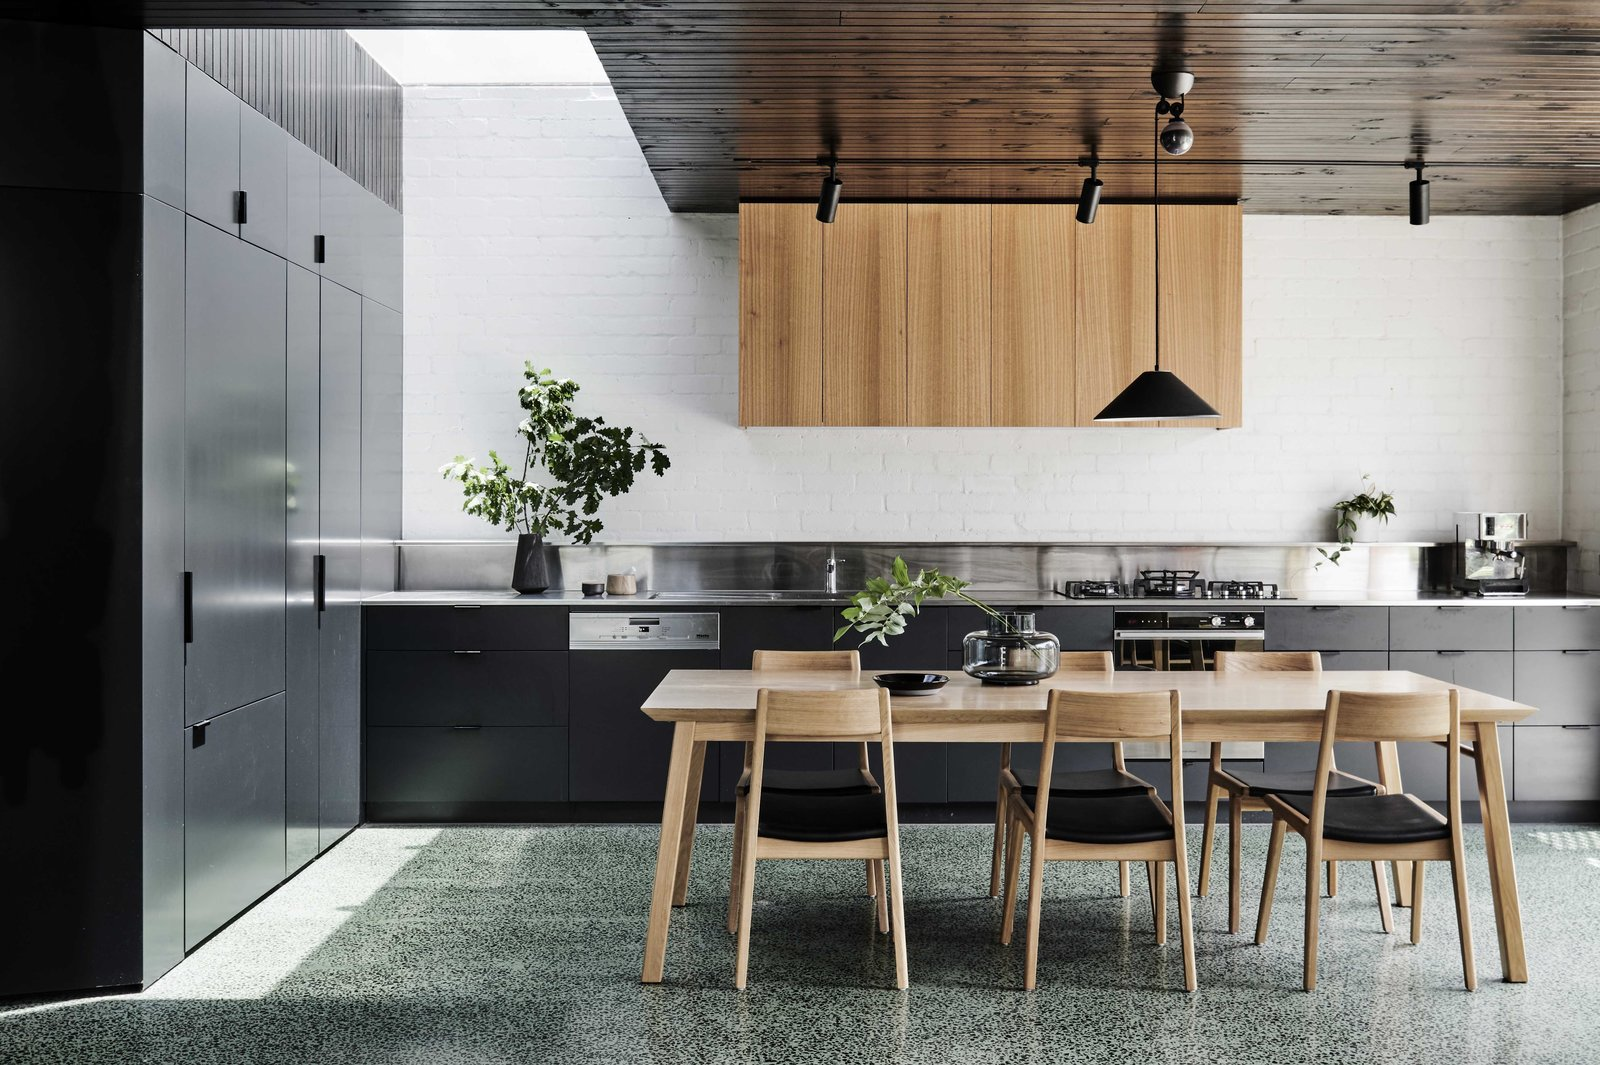 Kitchen, Ceiling, Range, Wall Oven, Range Hood, Terrazzo, Drop In, Brick, Refrigerator, and Pendant  Kitchen Range Hood Pendant Ceiling Drop In Photos